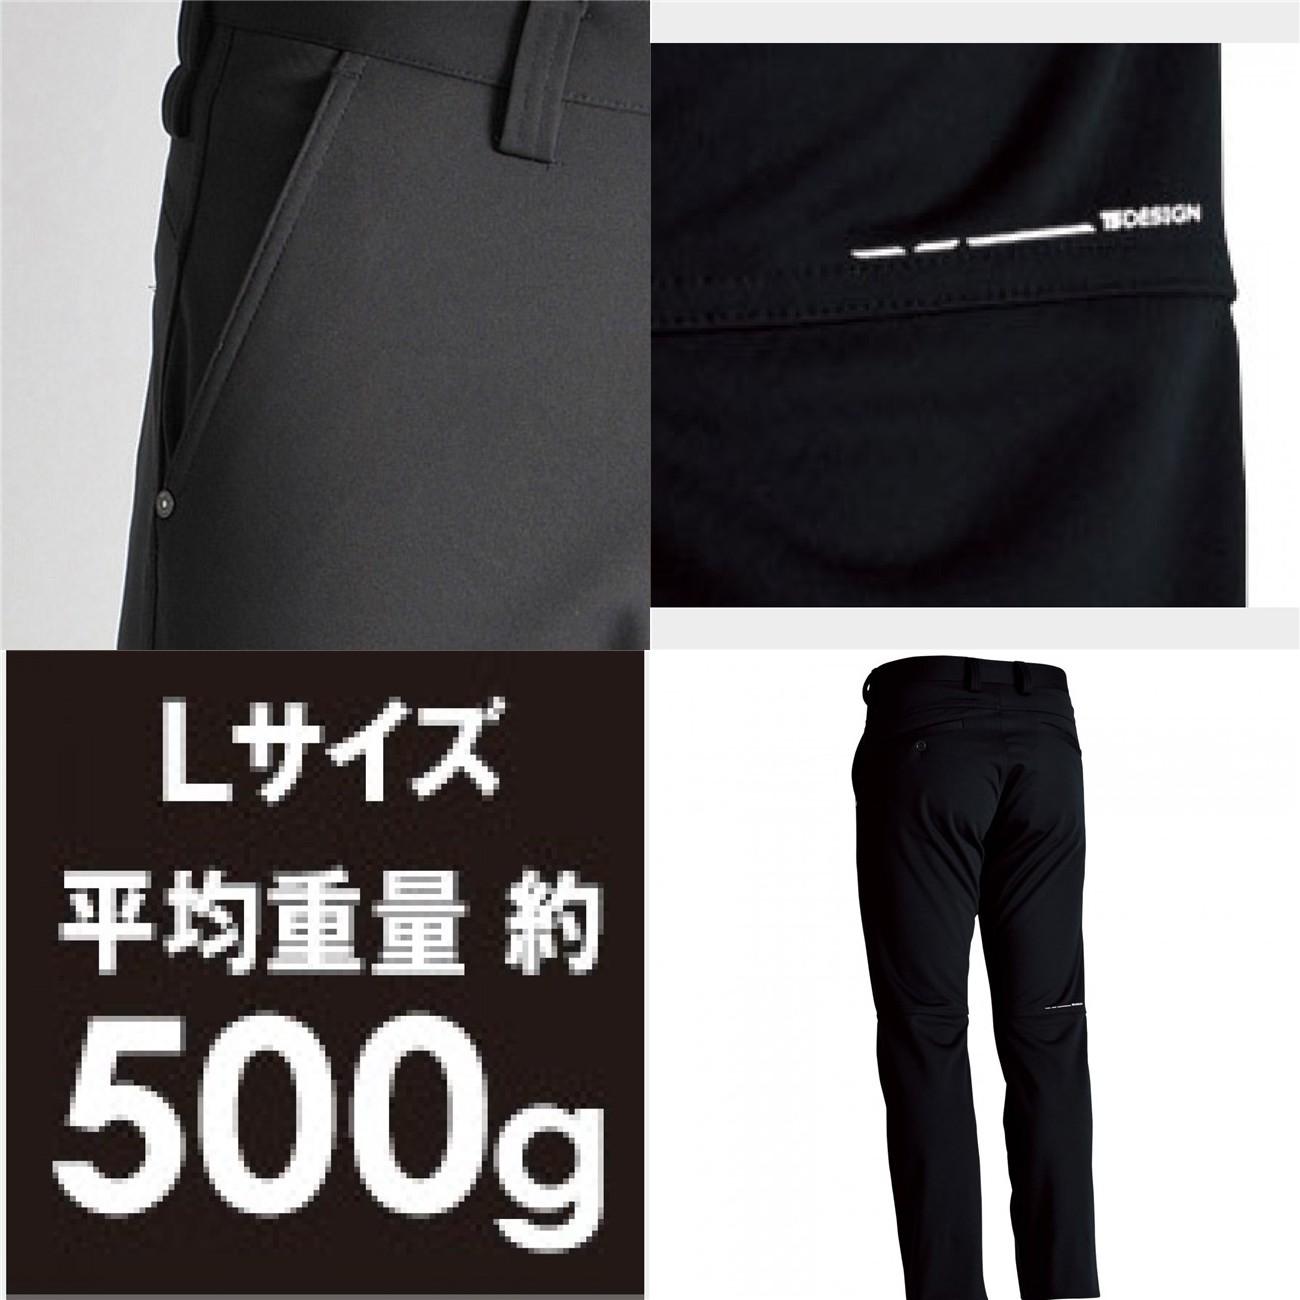 【TSDESIGN】無重力區防風伸縮褲ZERO GRAVITY  - 「Webike-摩托百貨」